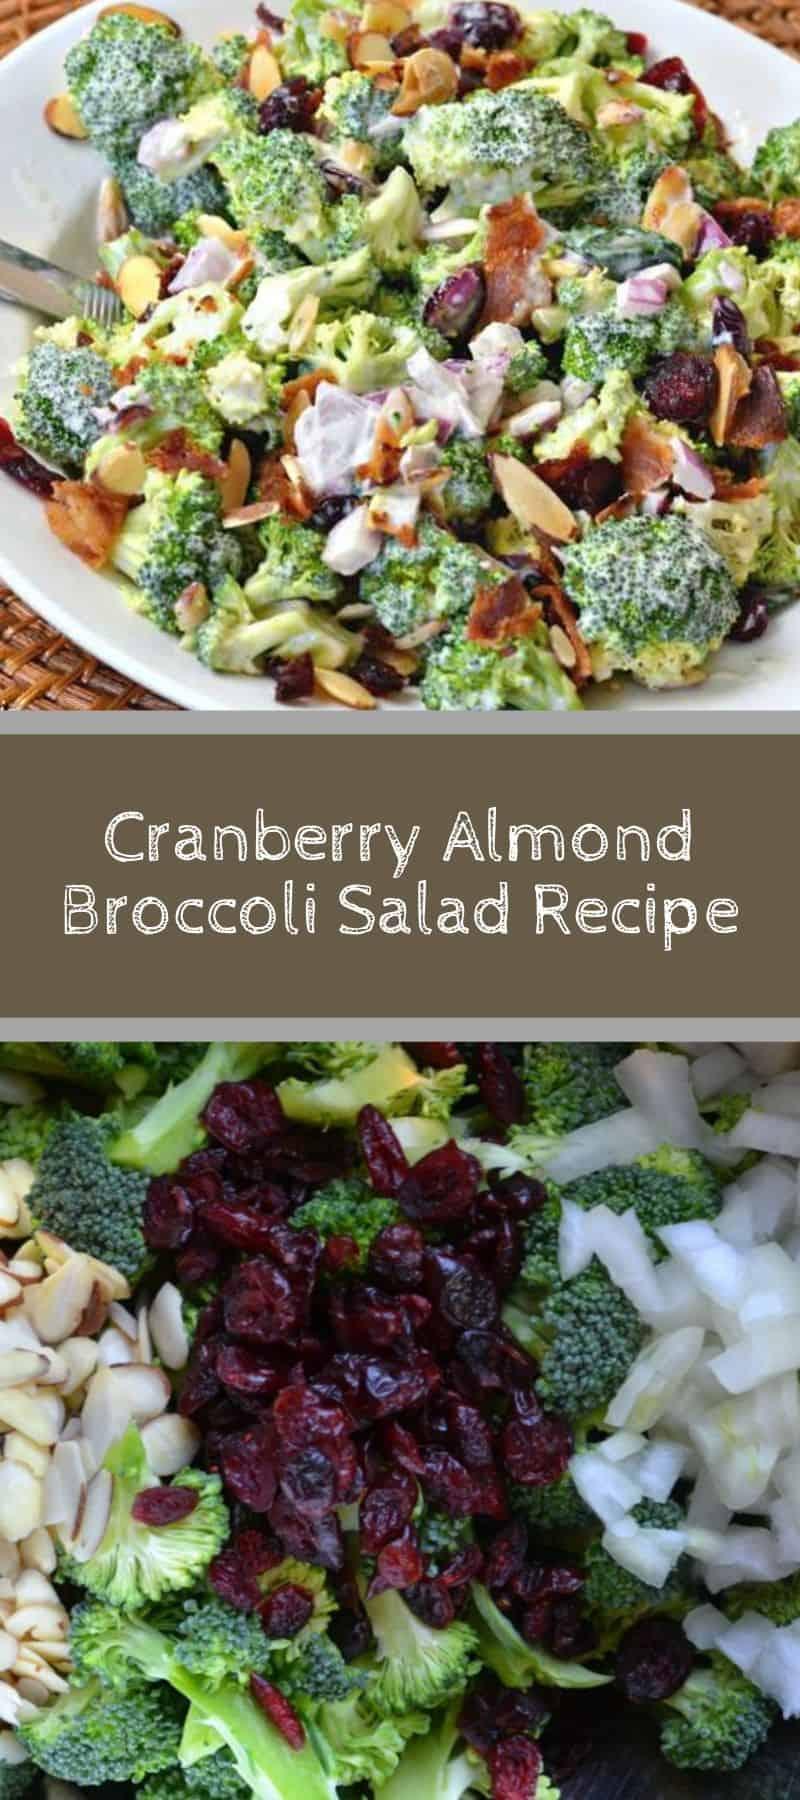 Cranberry Almond Broccoli Salad Recipe 3